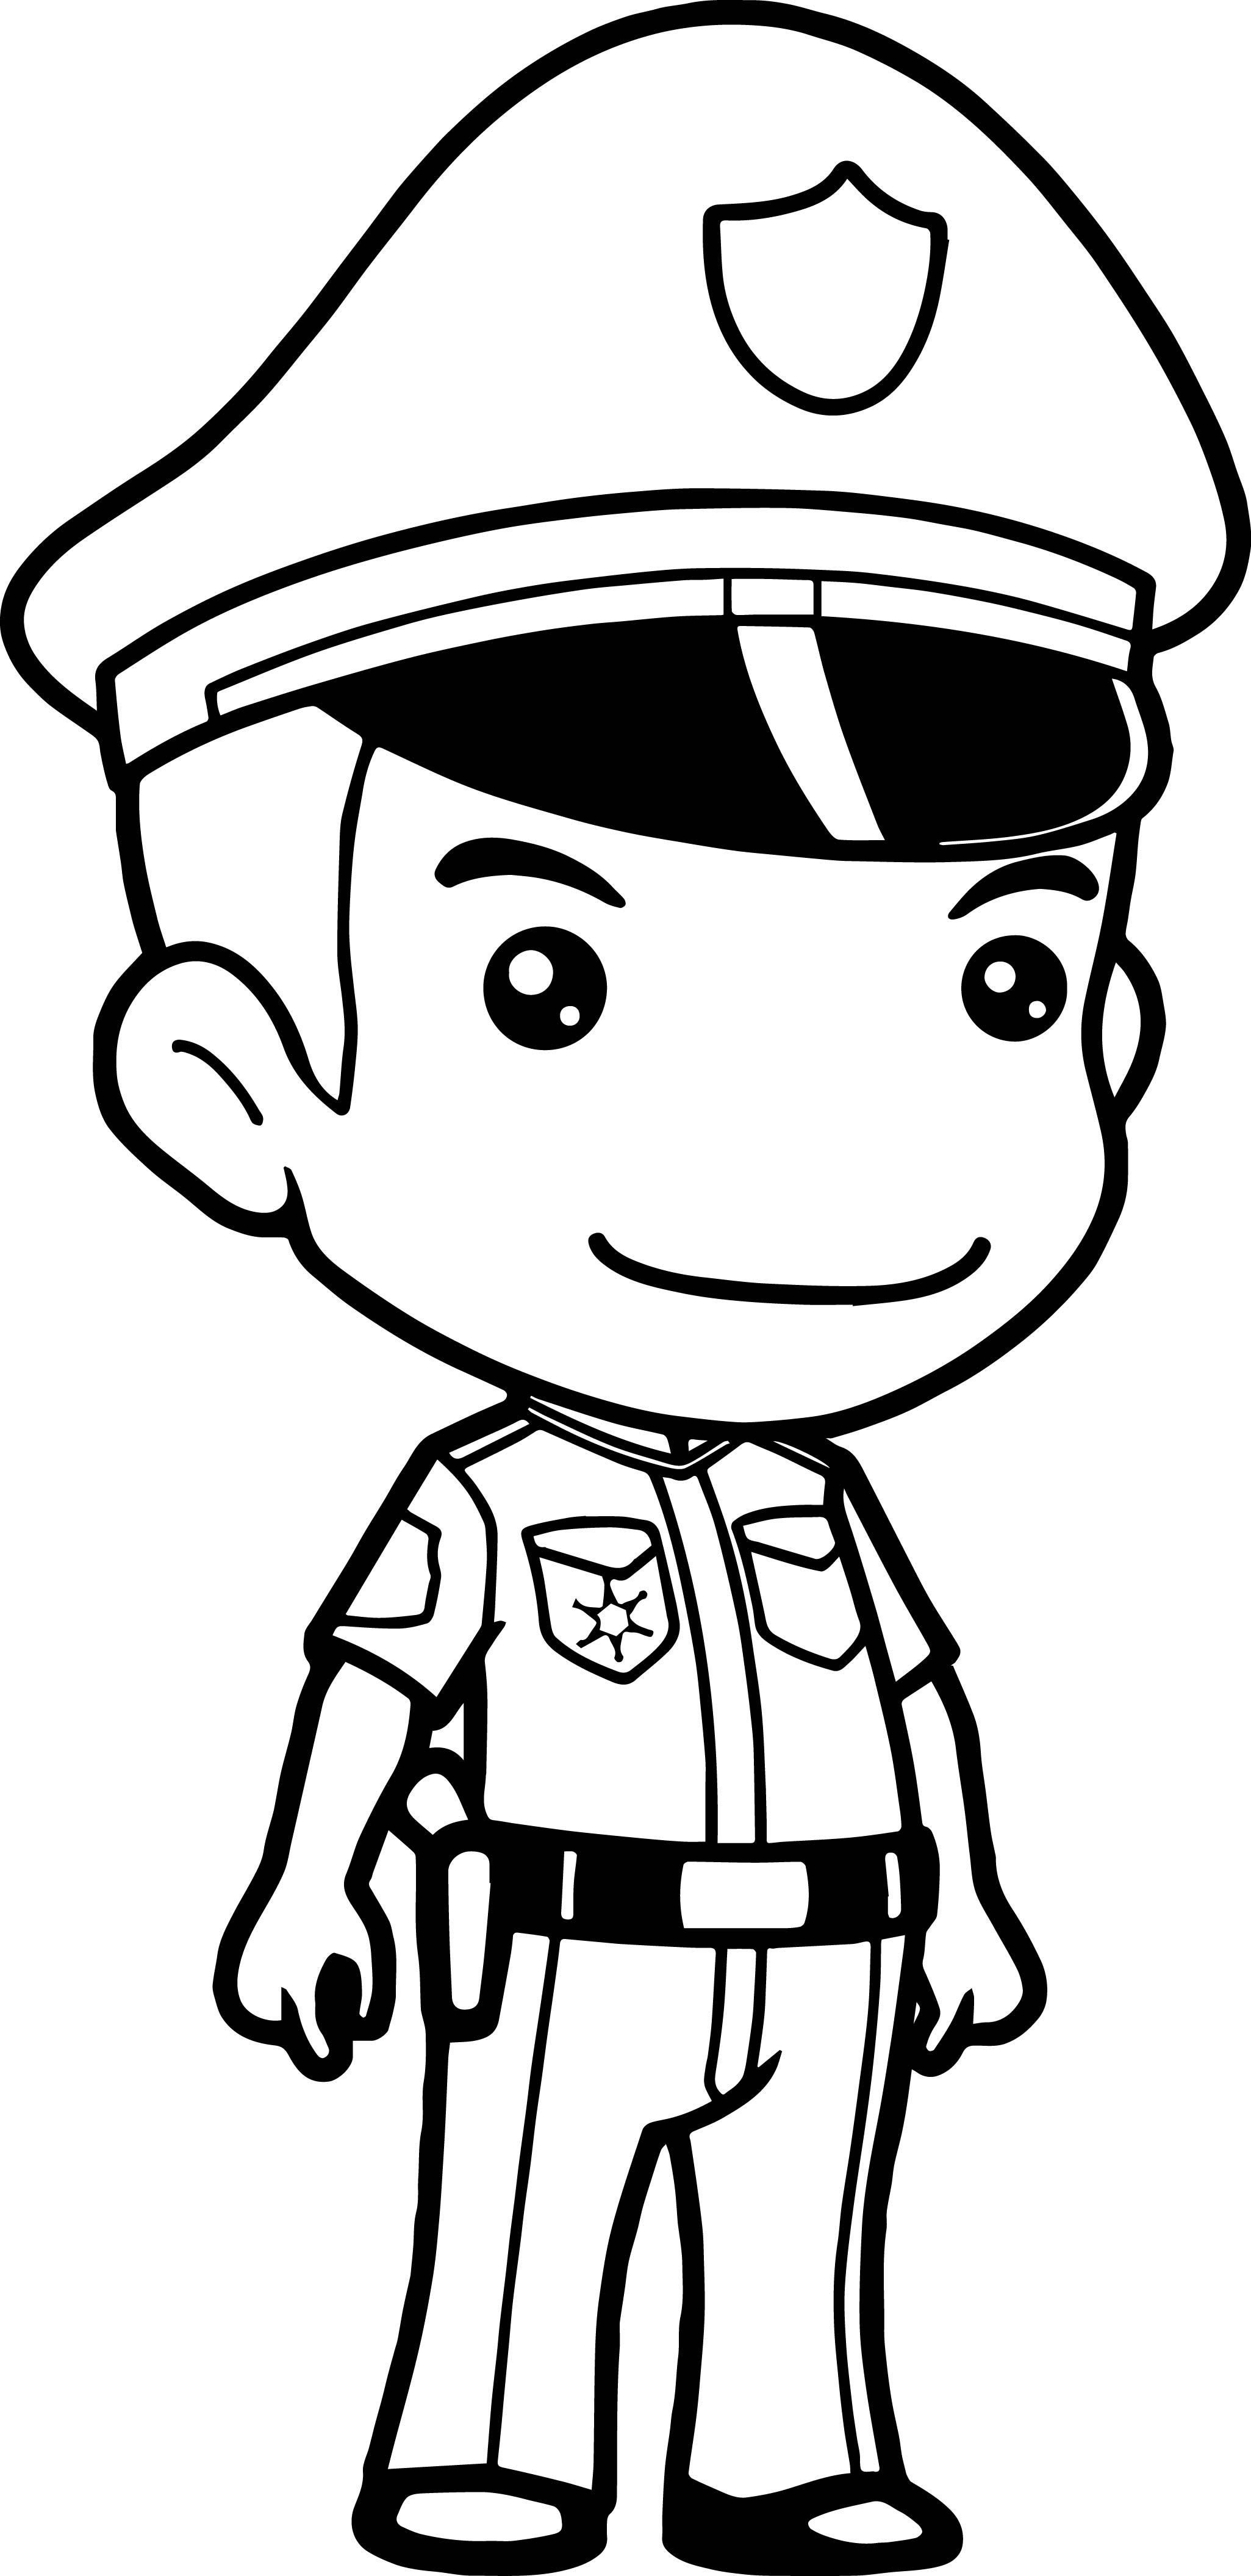 police coloring page free printable policeman coloring pages for kids police page coloring